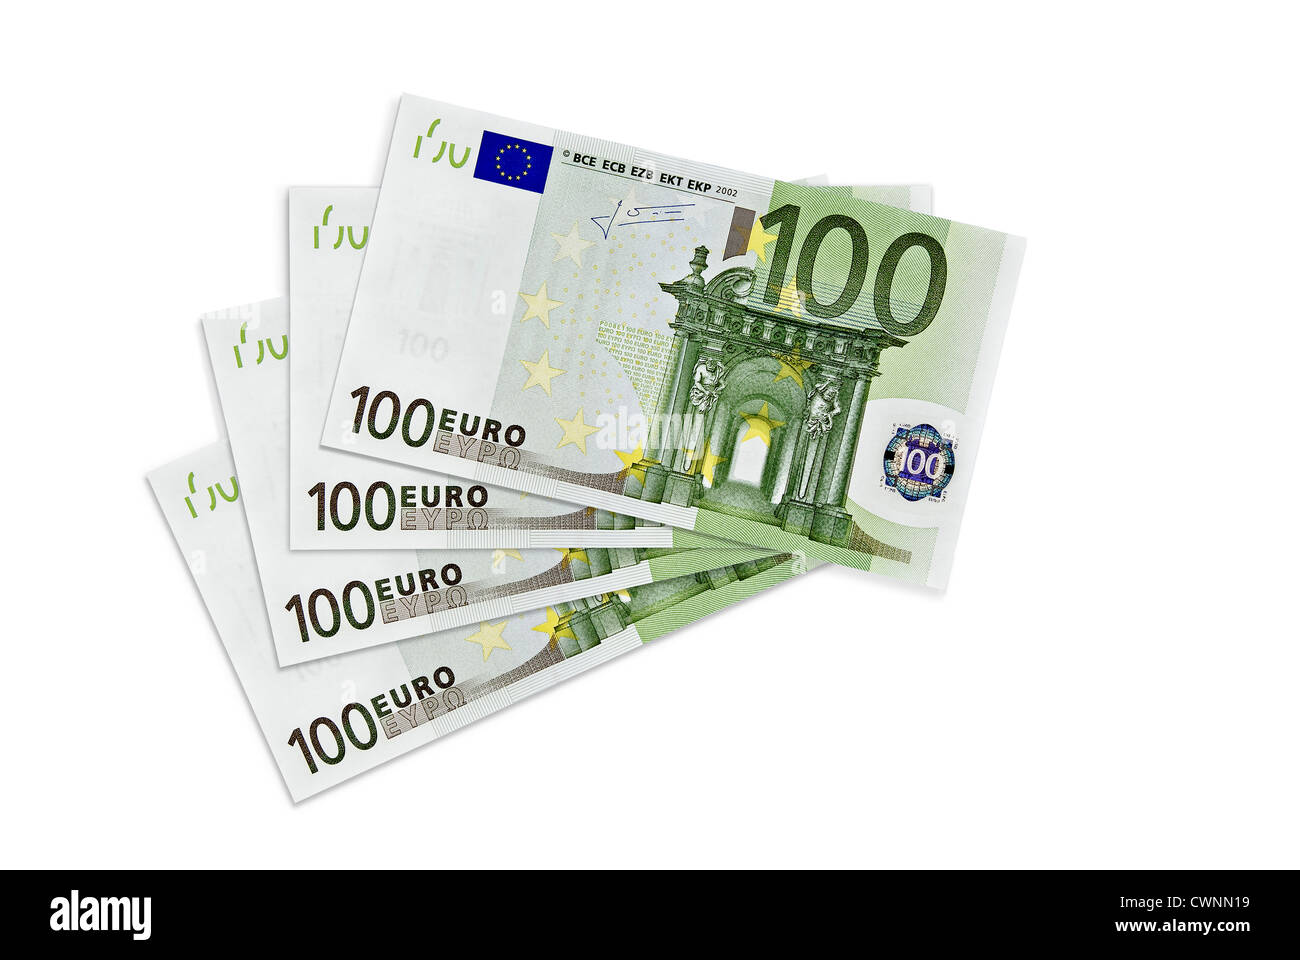 400 In Euros